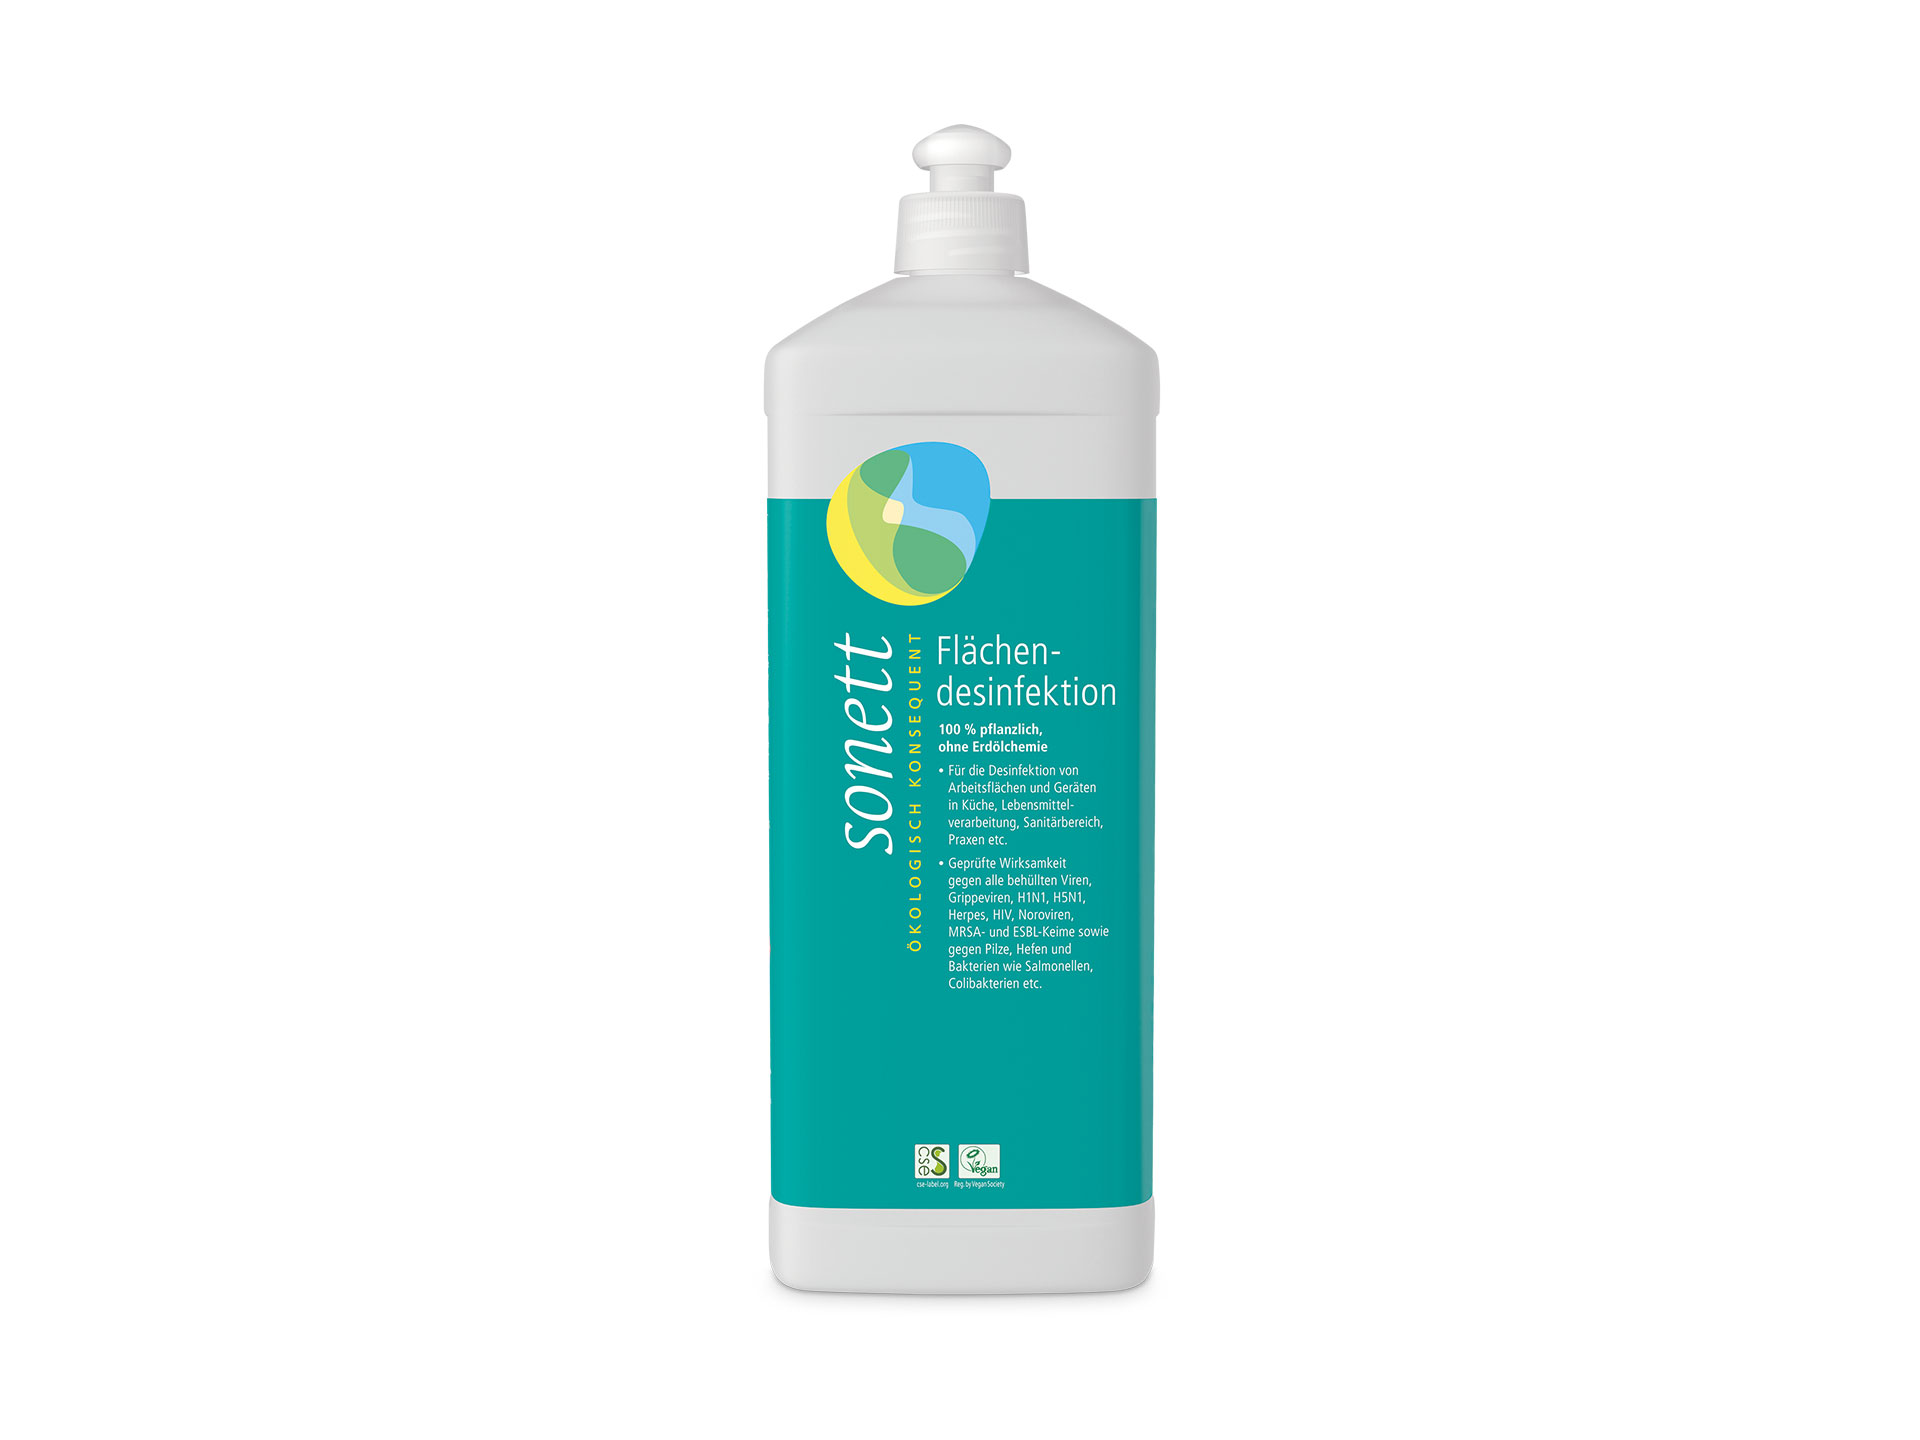 Bio Flächendesinfektion - Sonett